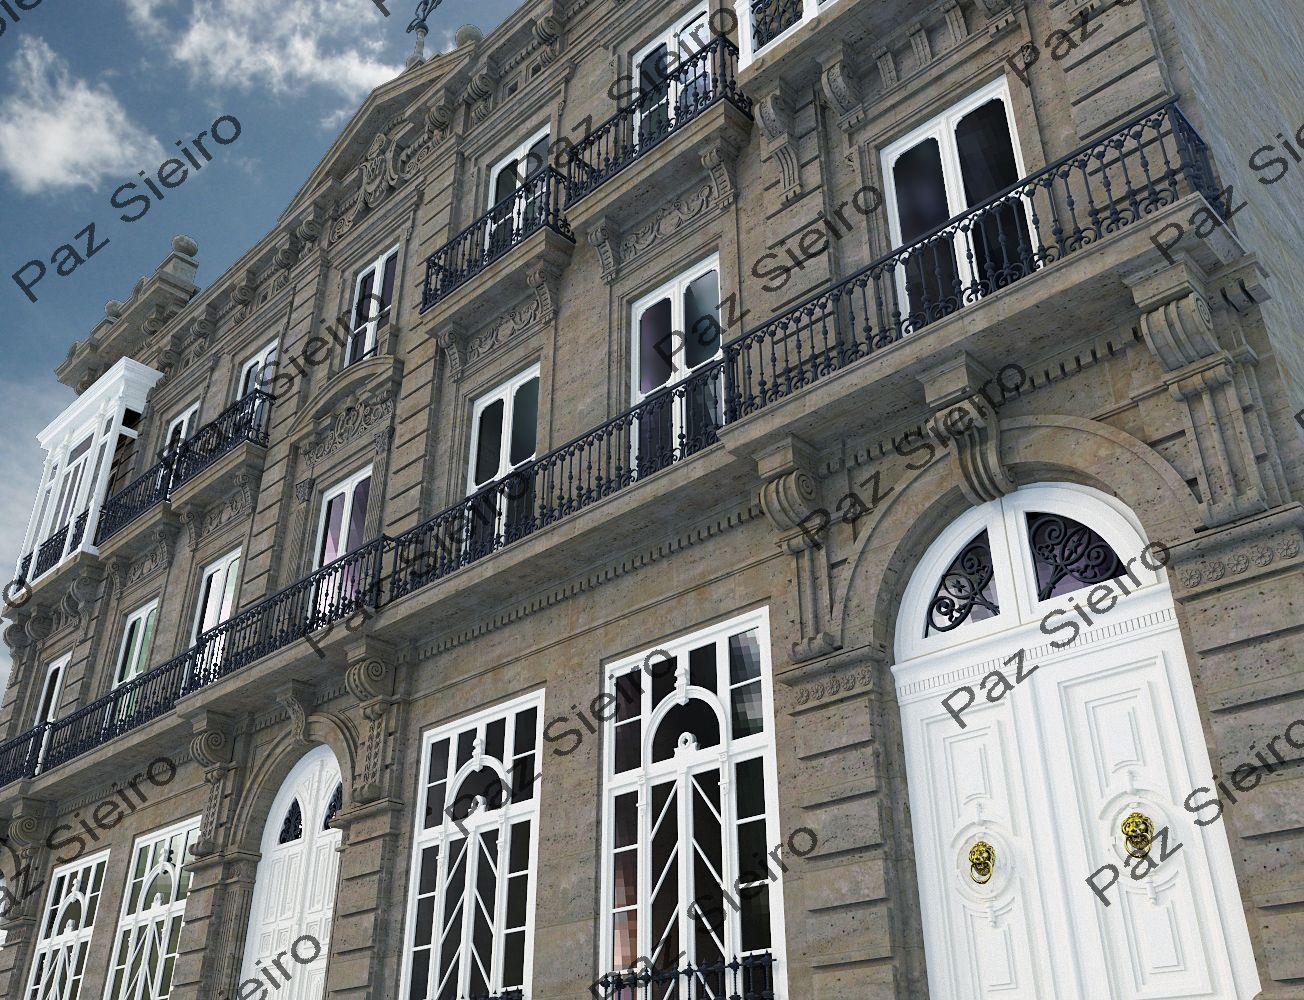 Works 3d edificio sime n 1894 r a progreso ourense - Arquitectos ourense ...